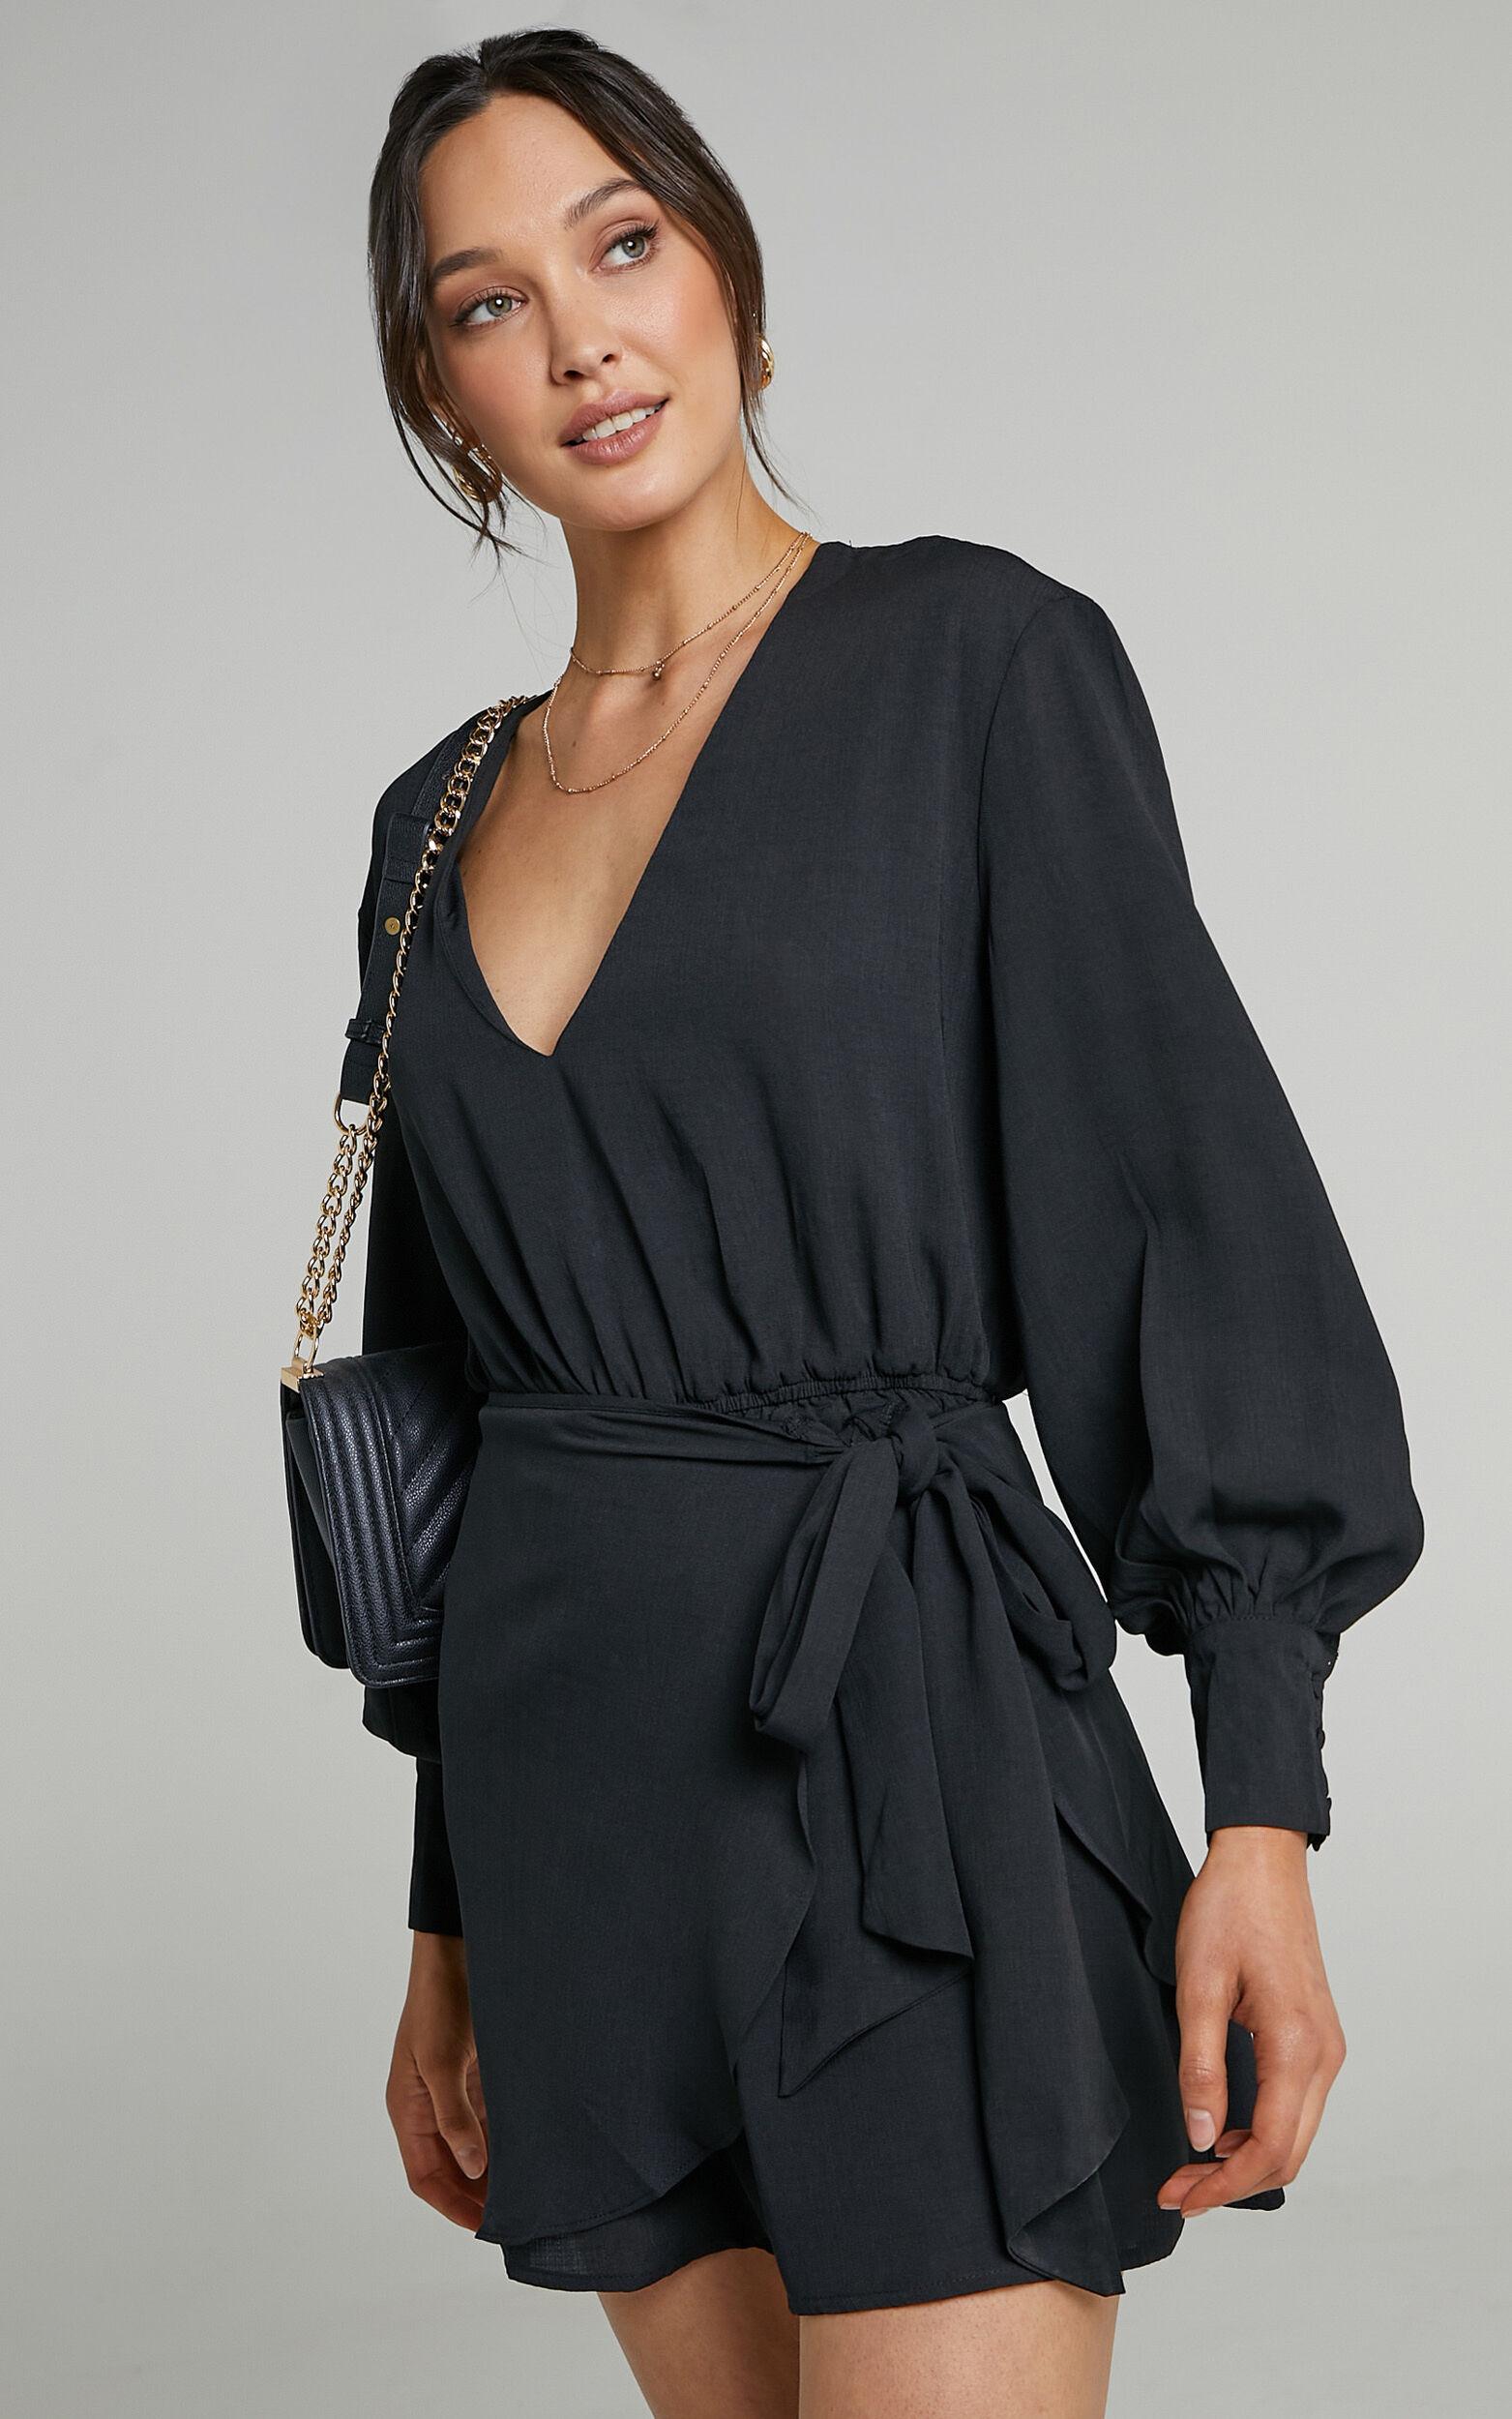 Luna Mini Length Dress with Self Tie Overlay Skirt in Black - 04, BLK1, super-hi-res image number null